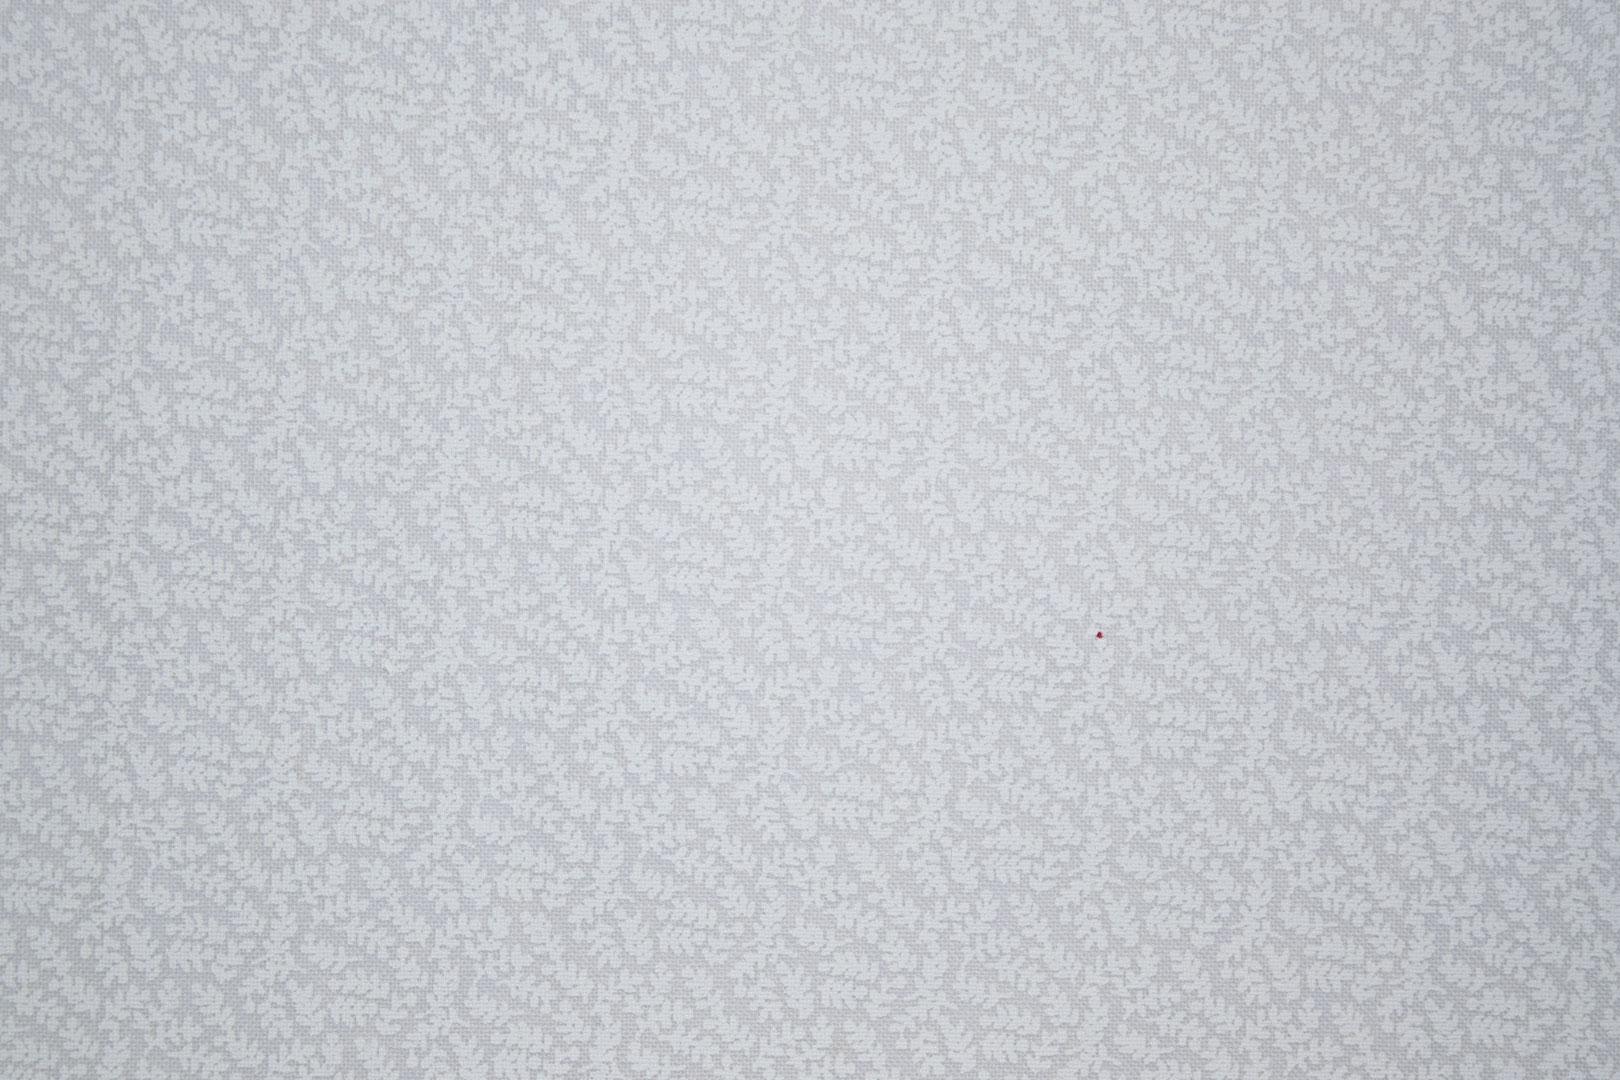 "12_42249_ww   108"" 68/68, 100% Carded Cotton"